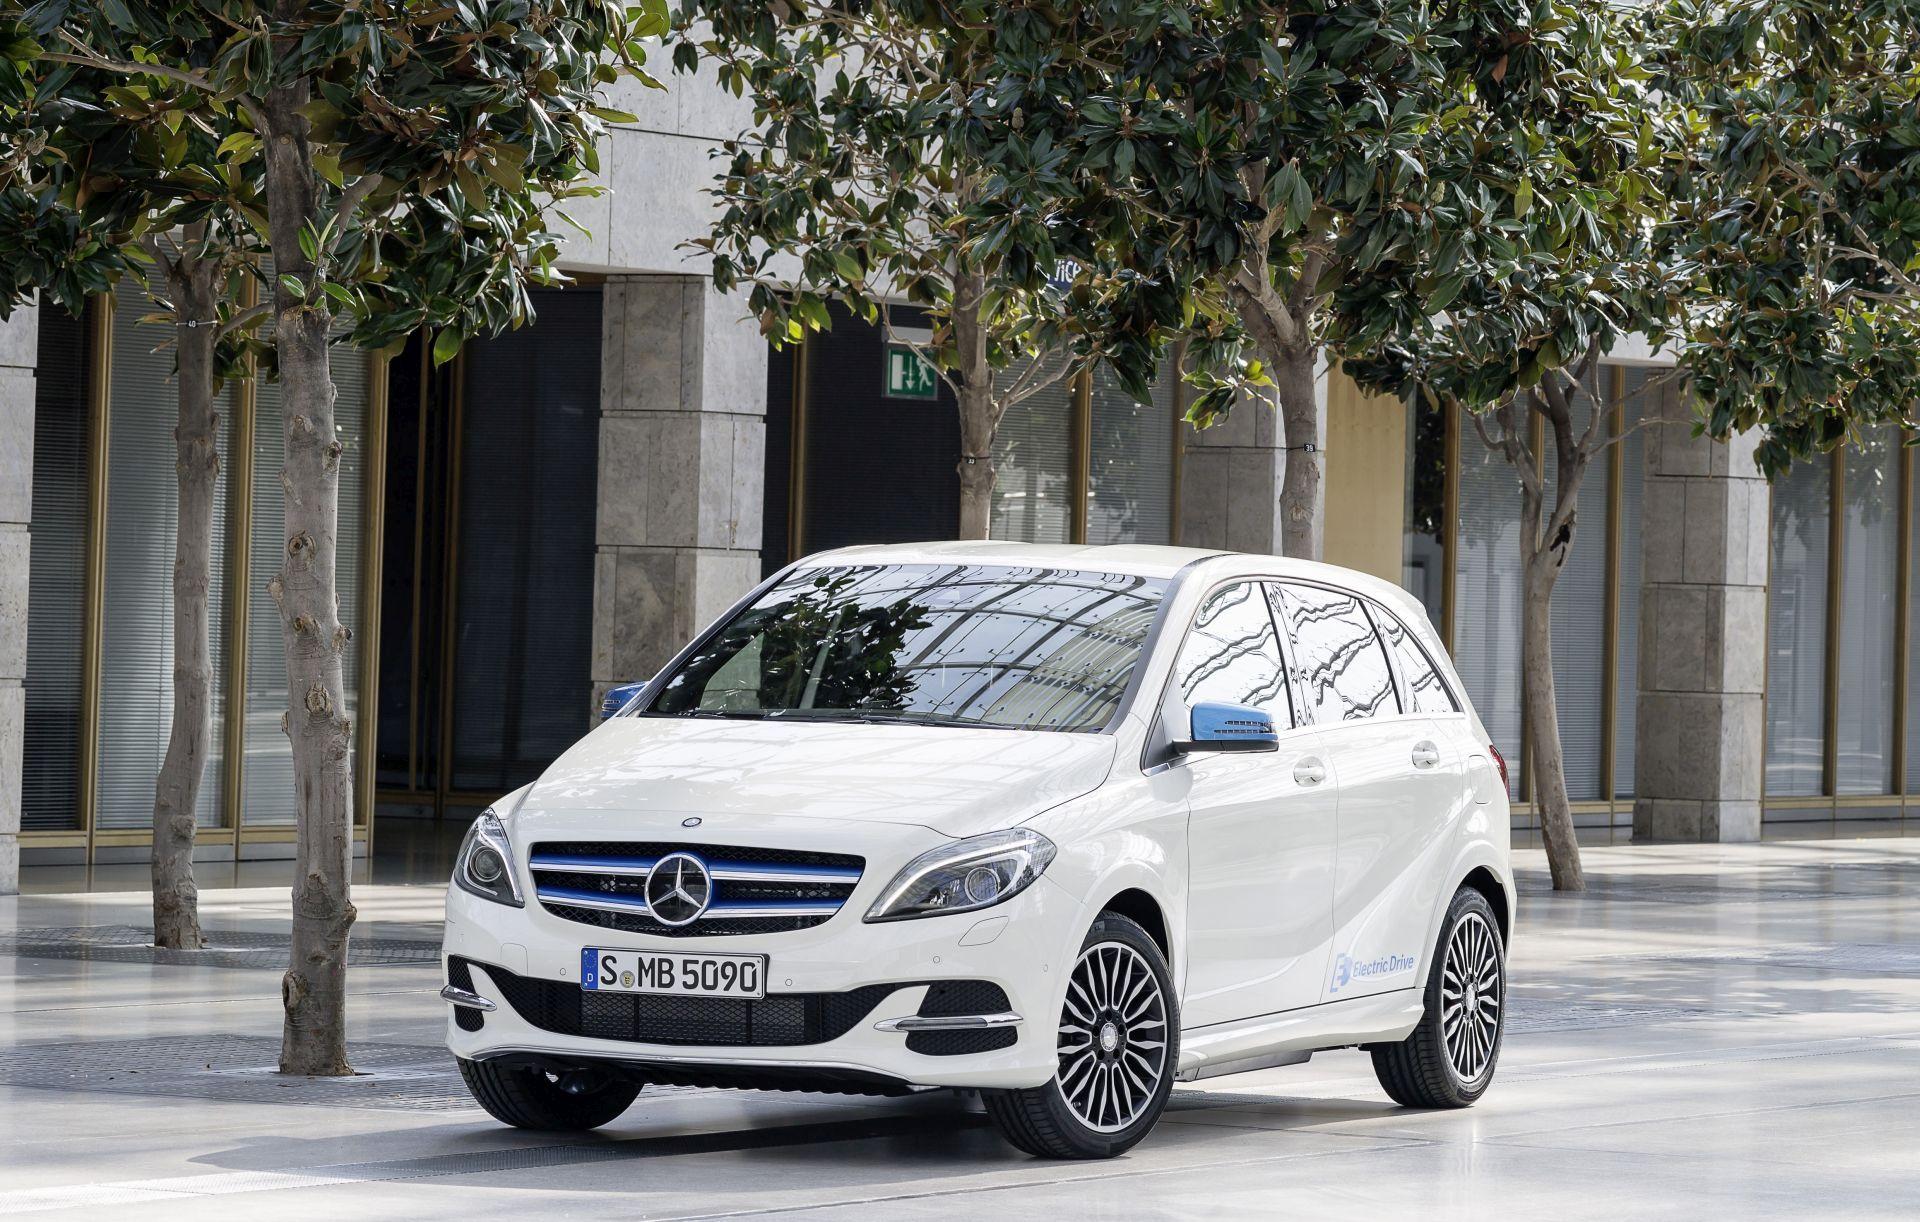 Mercedes-Benz B-Klasse Modelljahr 2014, B-Klasse Electric Drive (W242), zirrusweiß ; Mercedes-Benz B-Class model year 2014, B-Class Electric Drive (W242), cirrus white;